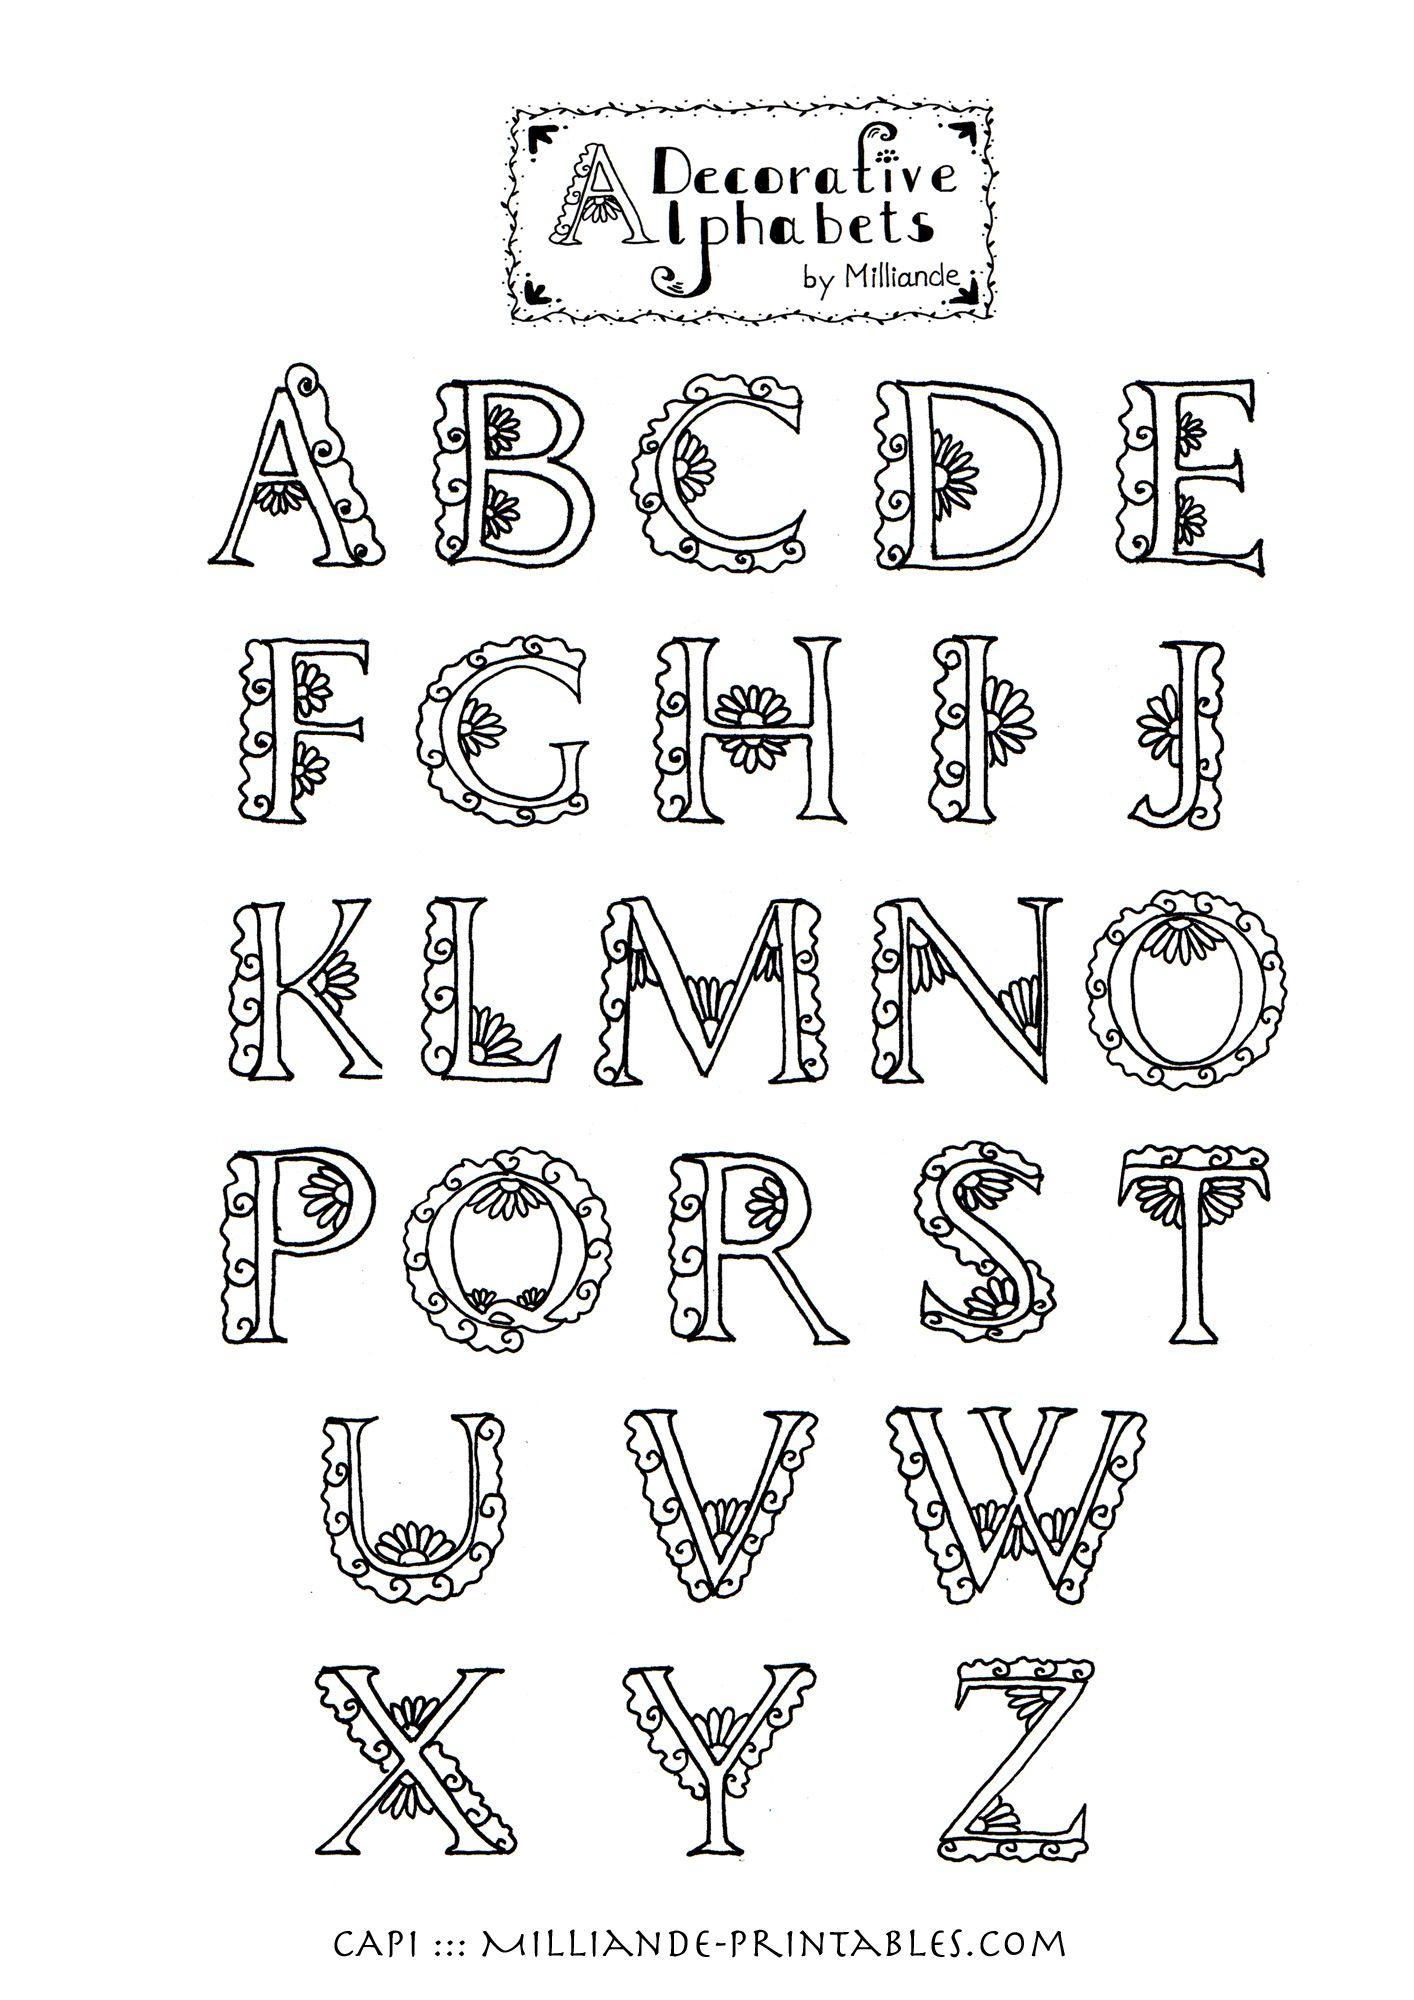 010 Free Printable Alphabet Templates Template ~ Ulyssesroom - Free Printable Alphabet Stencils